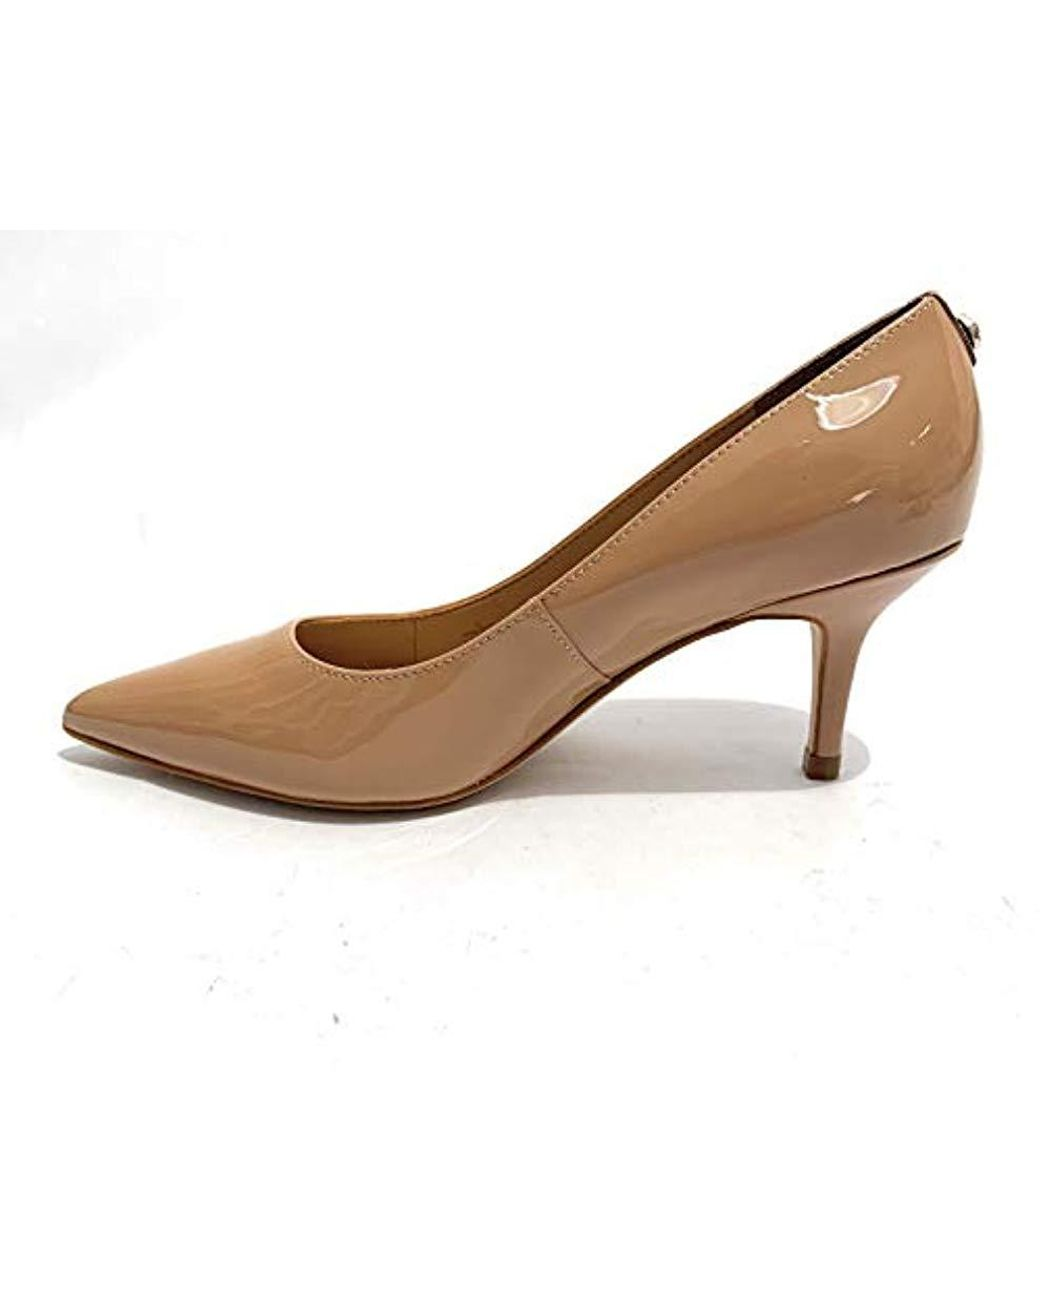 Guess Footwear Dress Sling Back Scarpe col Tacco con Plateau Donna